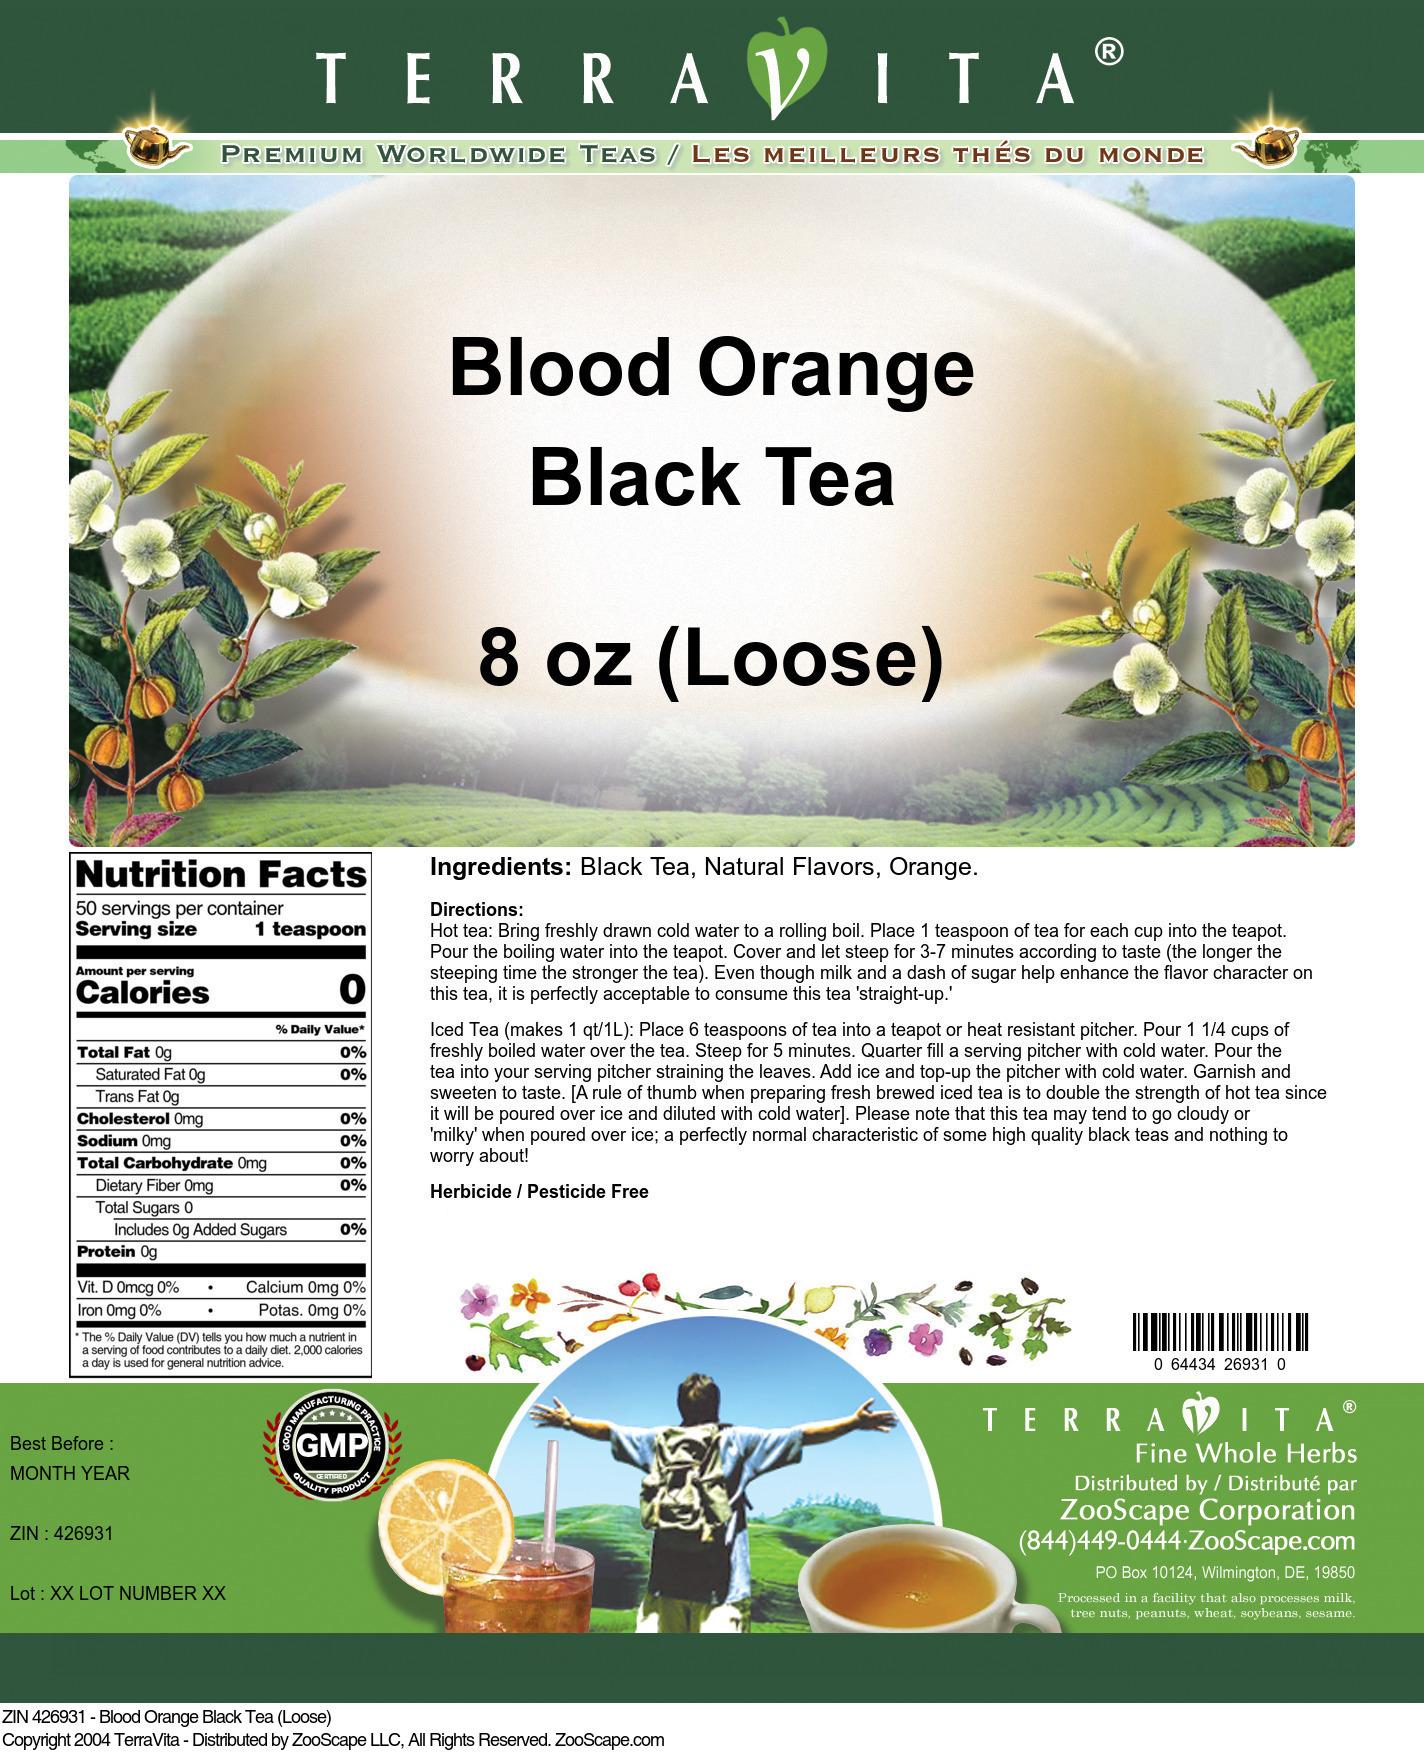 Blood Orange Tea (Loose) - Label